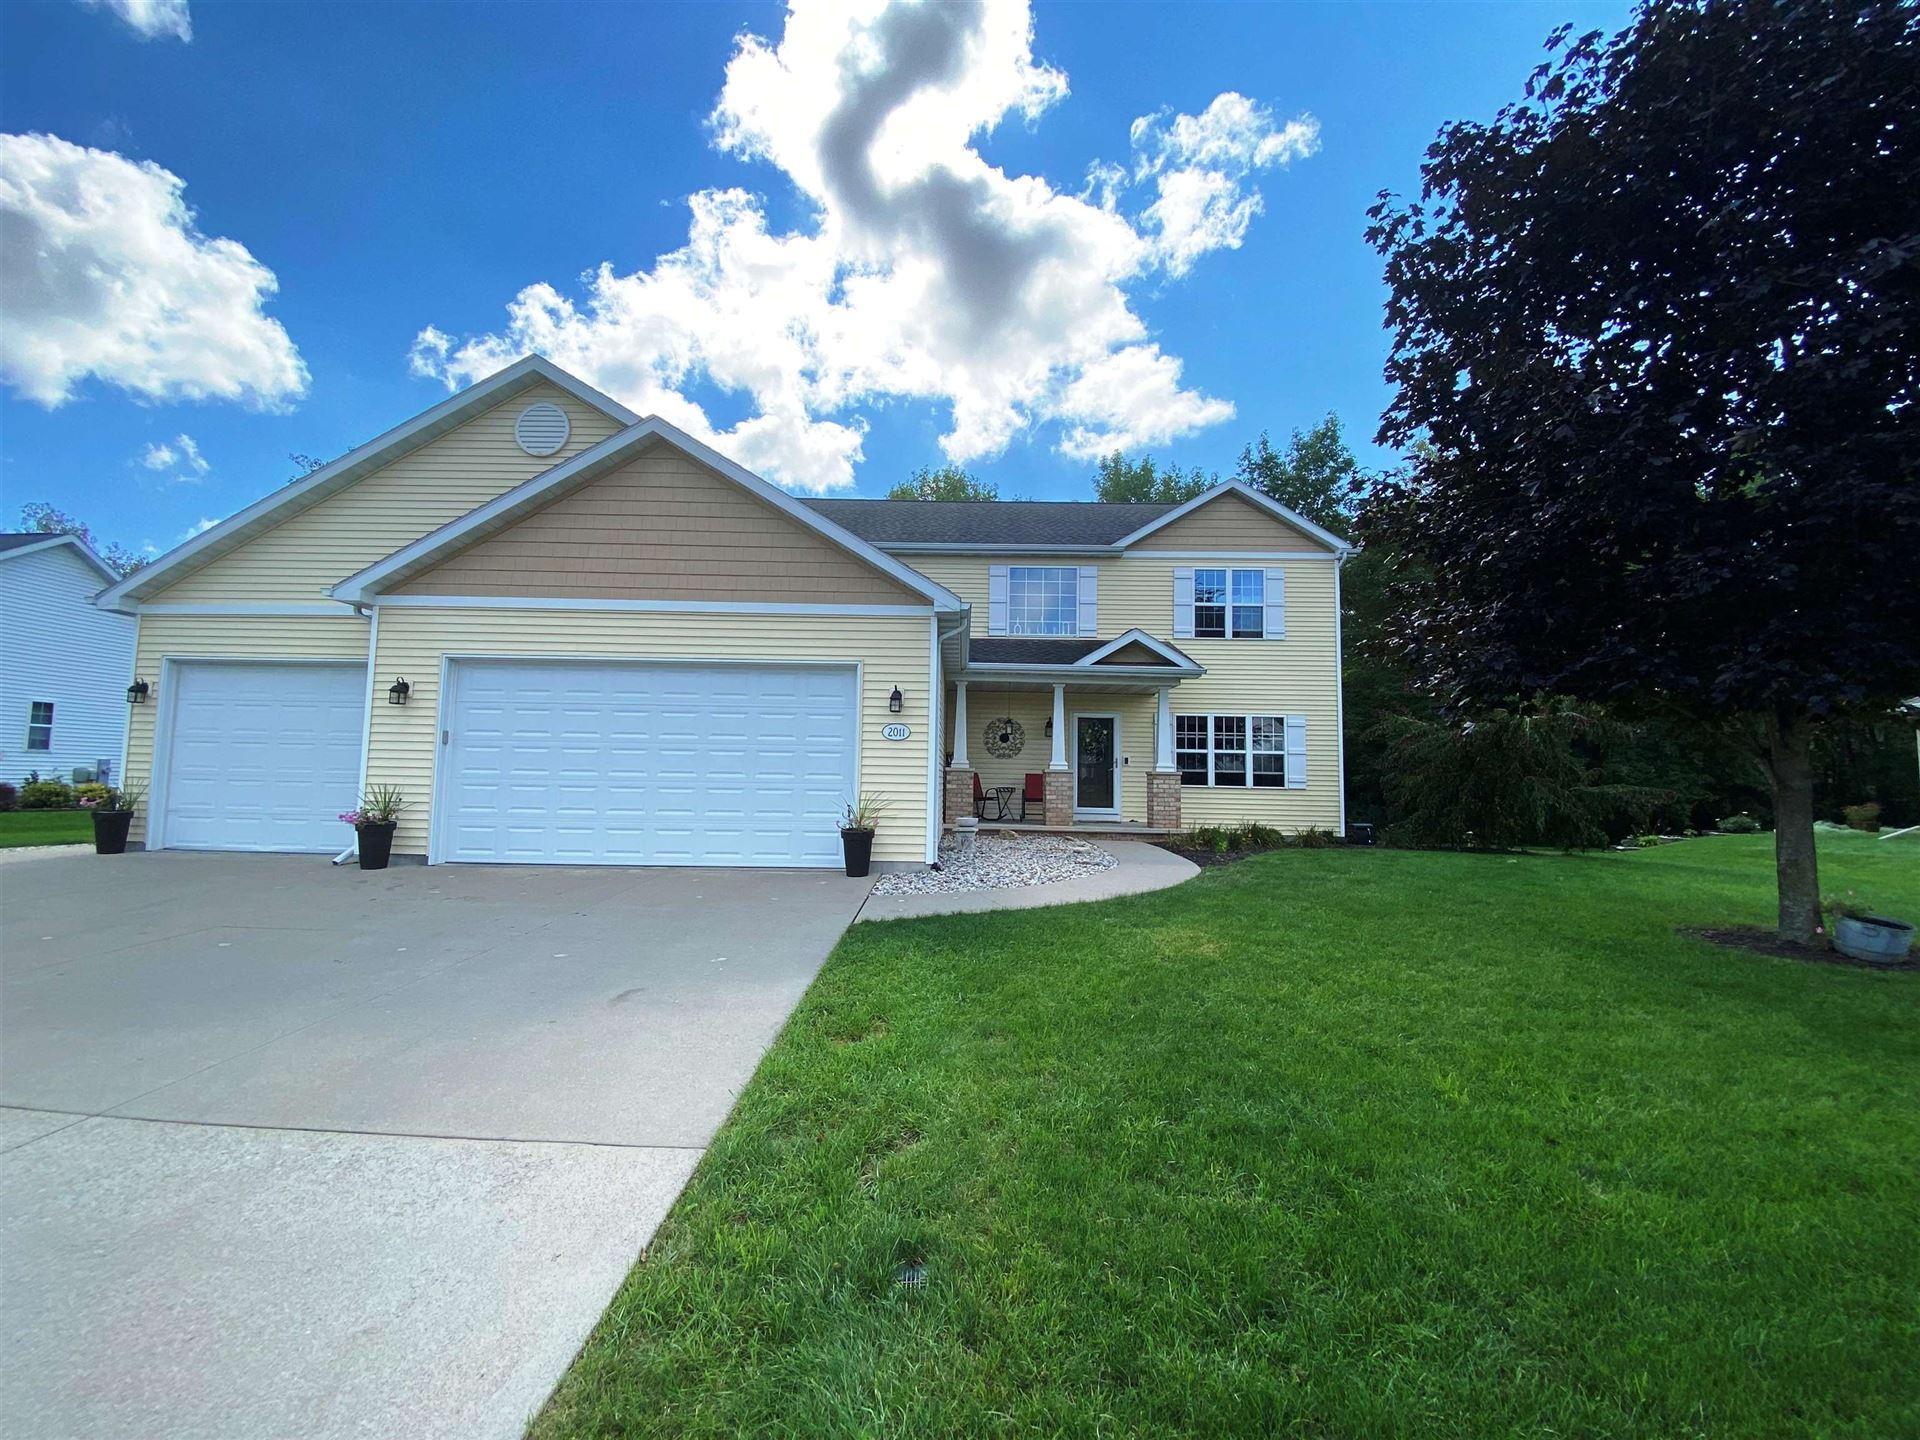 2011 HIDDEN CREEK Road, Neenah, WI 54956 - MLS#: 50248358